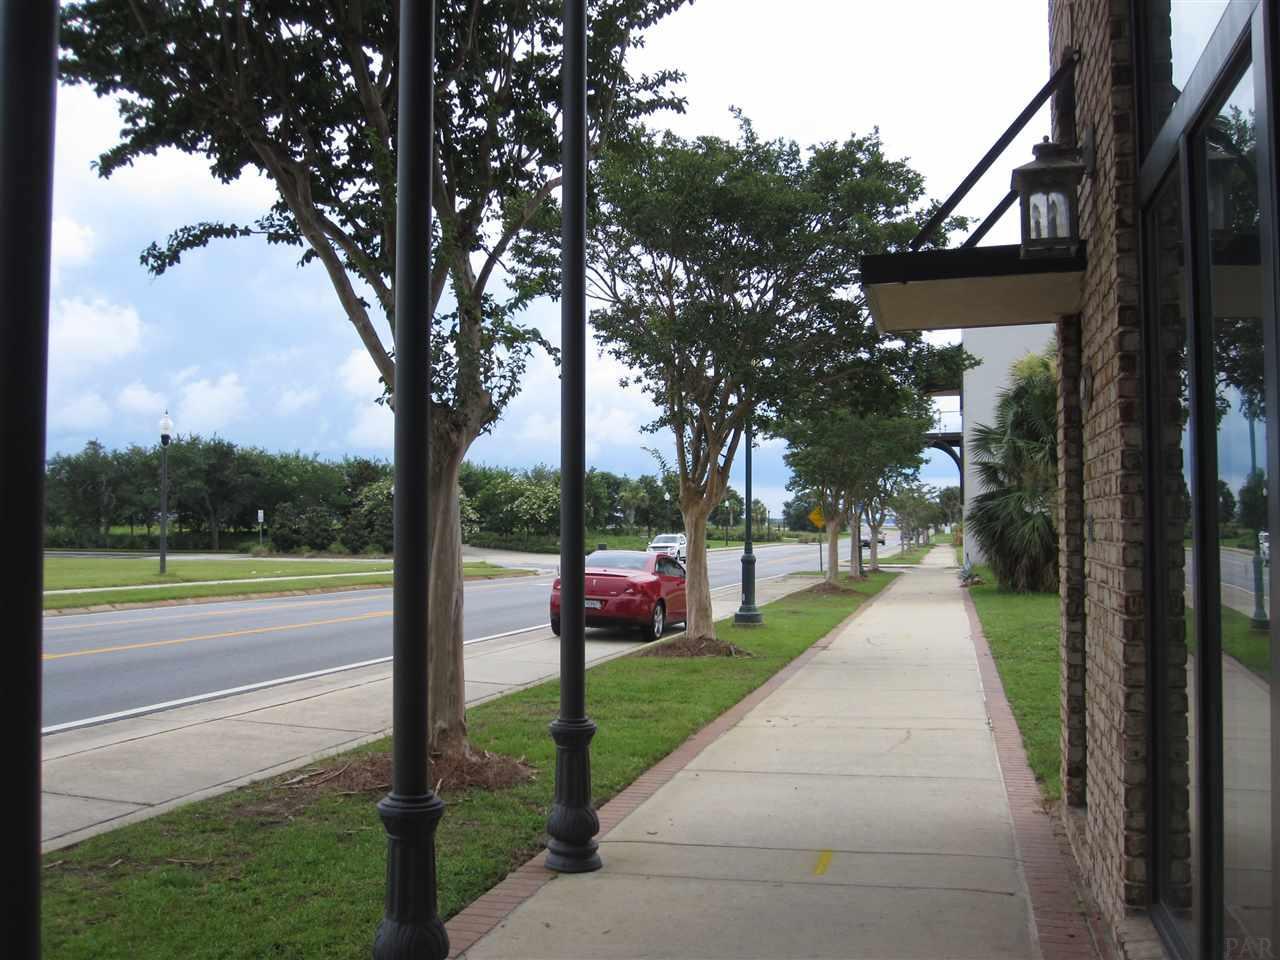 45 S 9th Ave, Pensacola, FL 32502